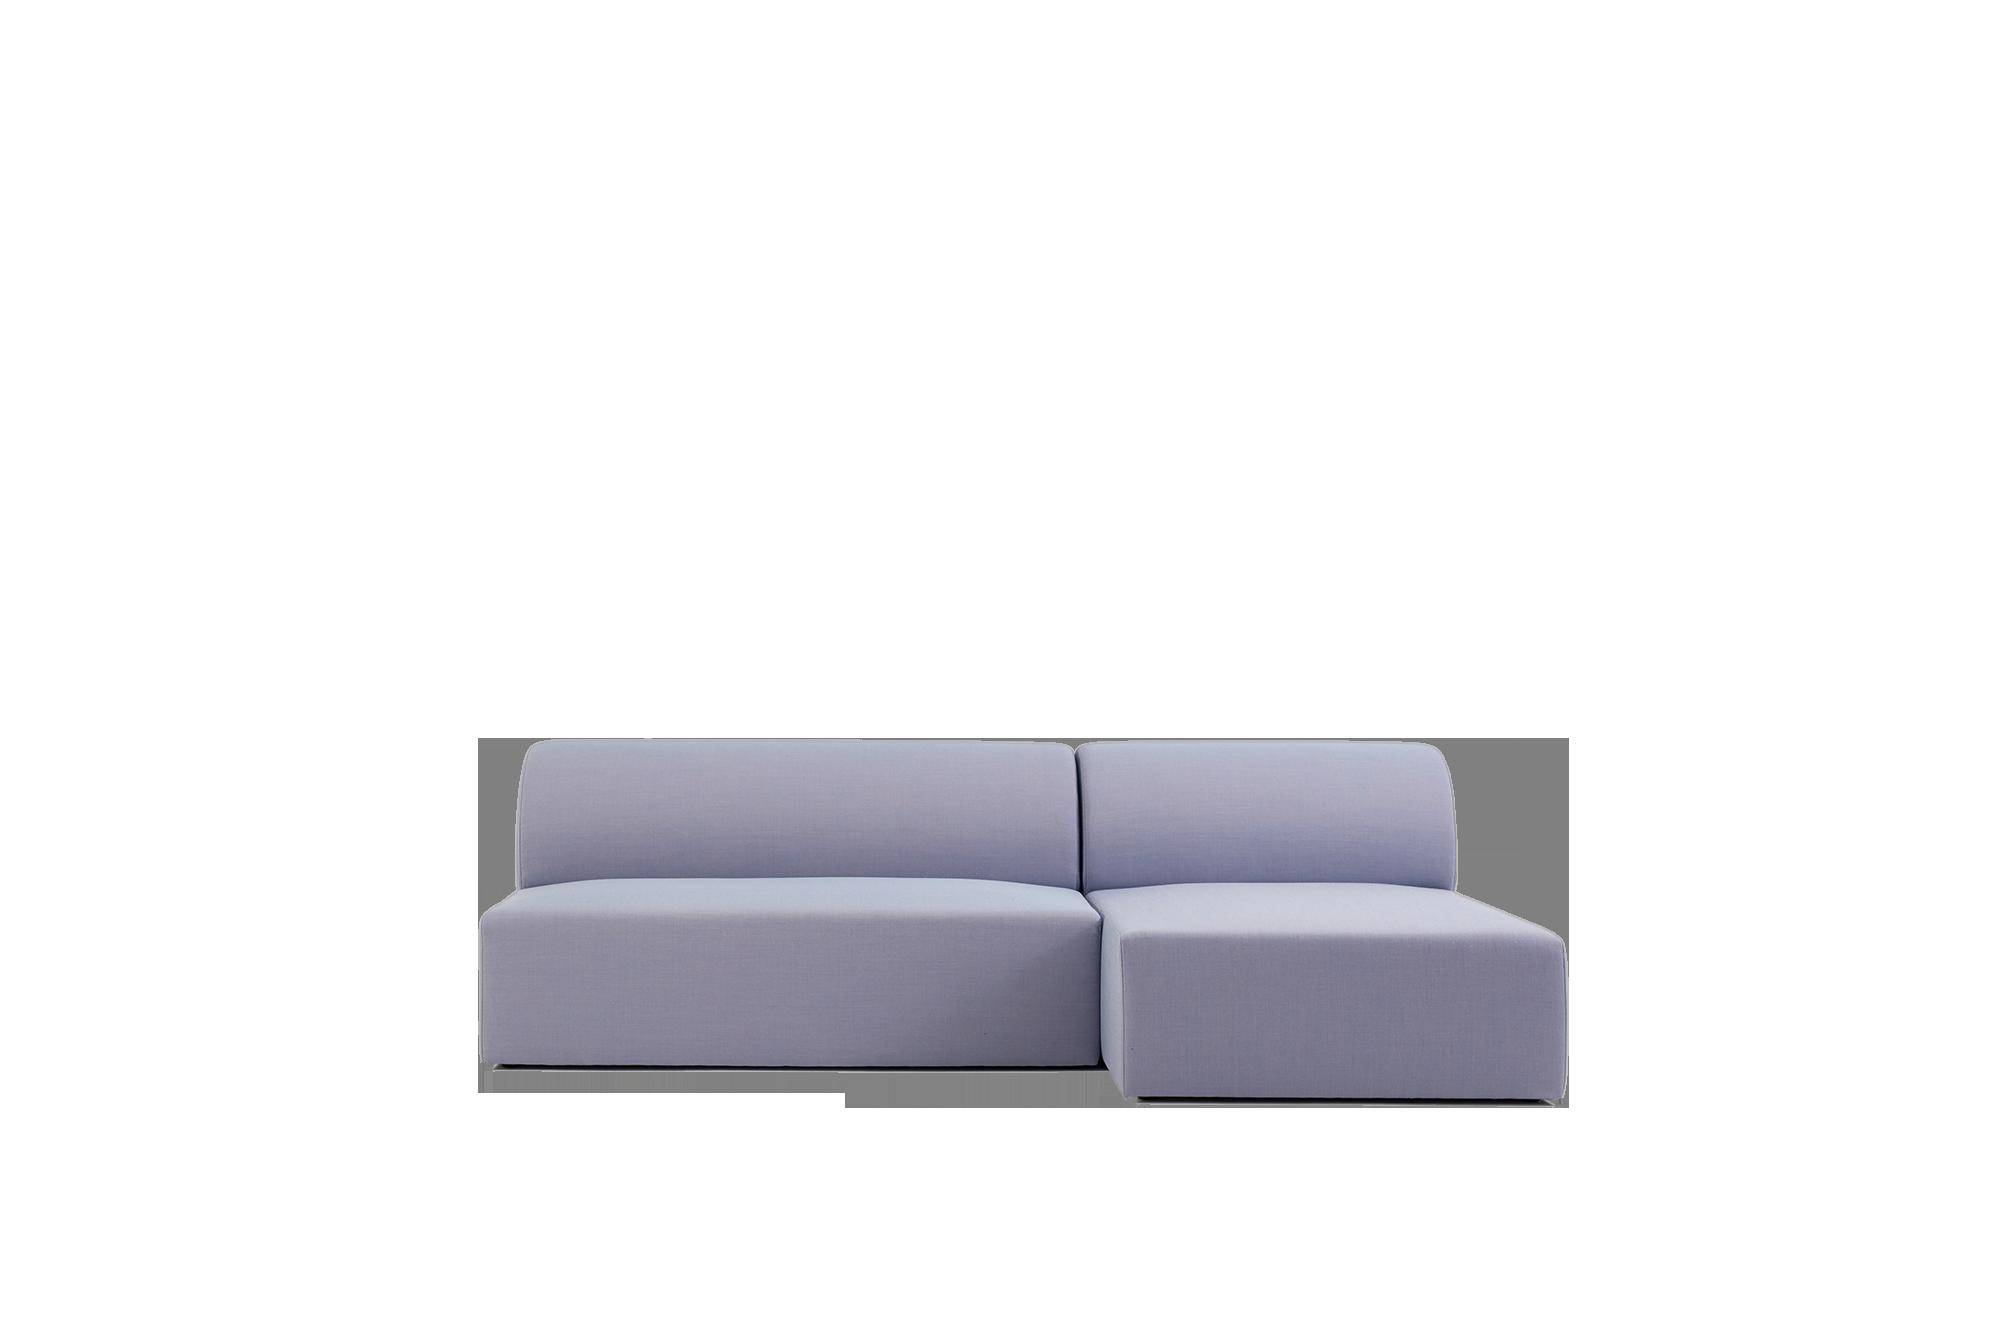 Full Size of Modulares Sofa Ikea Lennon Dhel Kissen Leder Modular Set Flex Indomo Kolonialstil Creme Federkern Spannbezug Bezug Recamiere Bunt Stoff Grau Vitra Mit Led Wohnzimmer Sofa Dhel